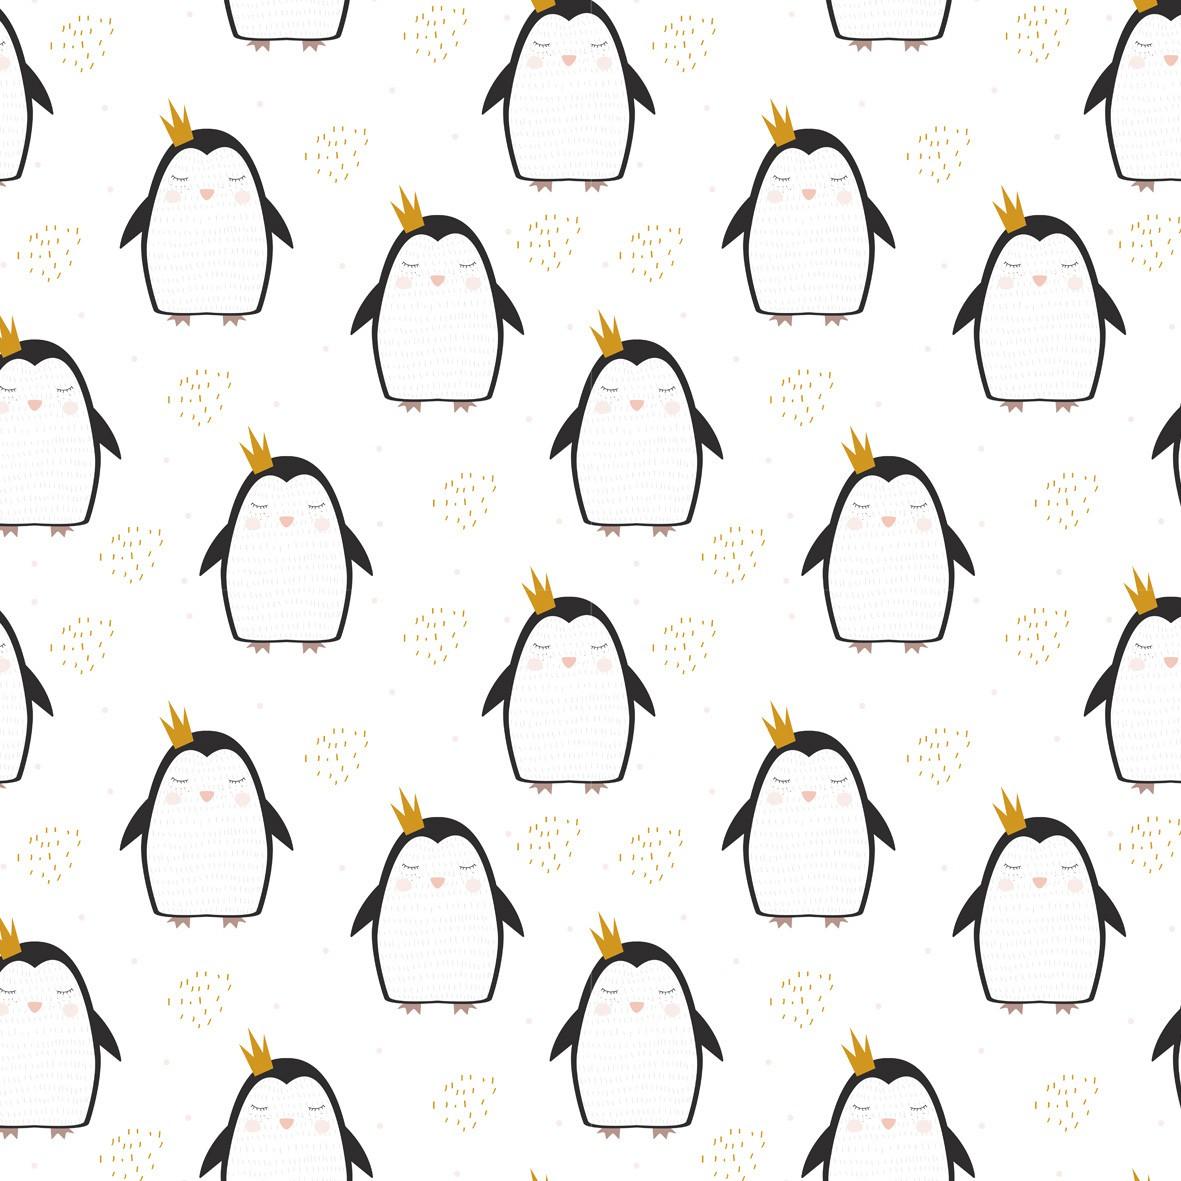 Lençol Avulso MINI CAMA / JÚNIOR - Pinguim